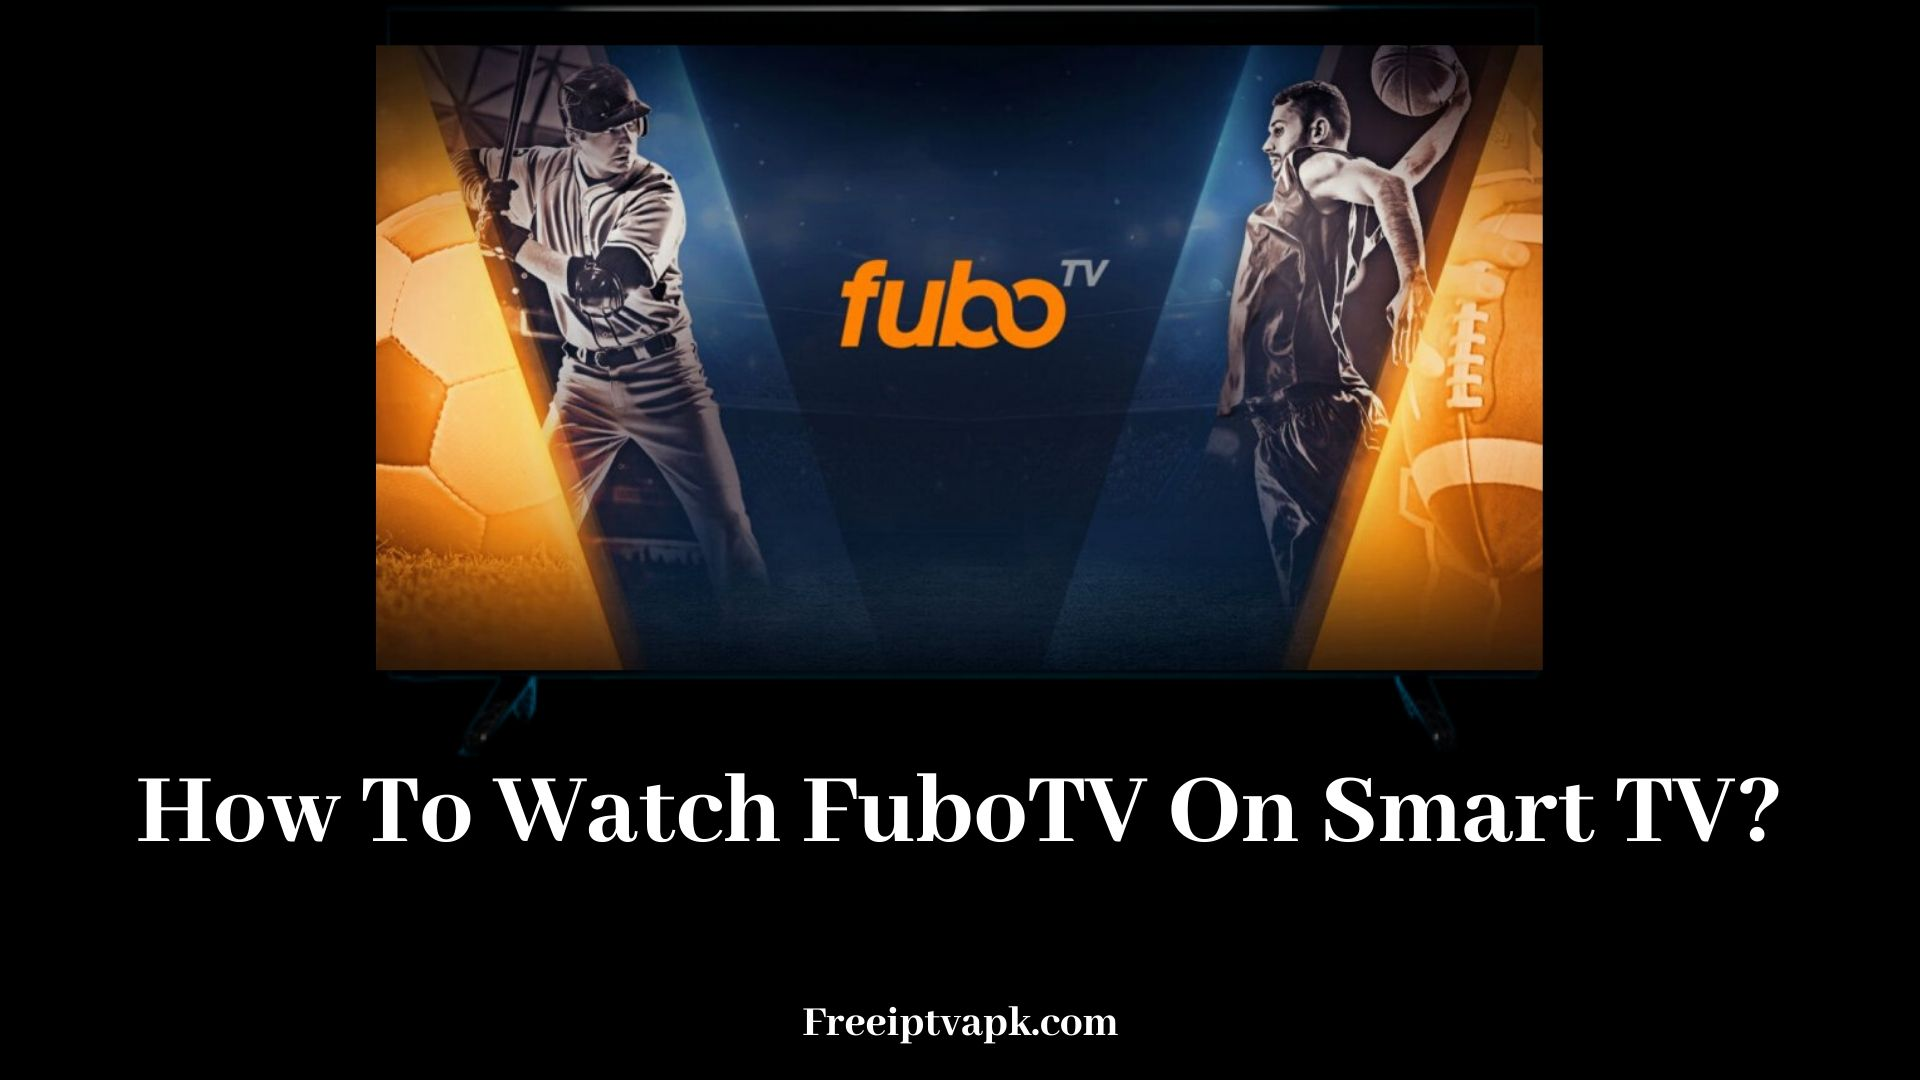 FuboTV On Smart TV?